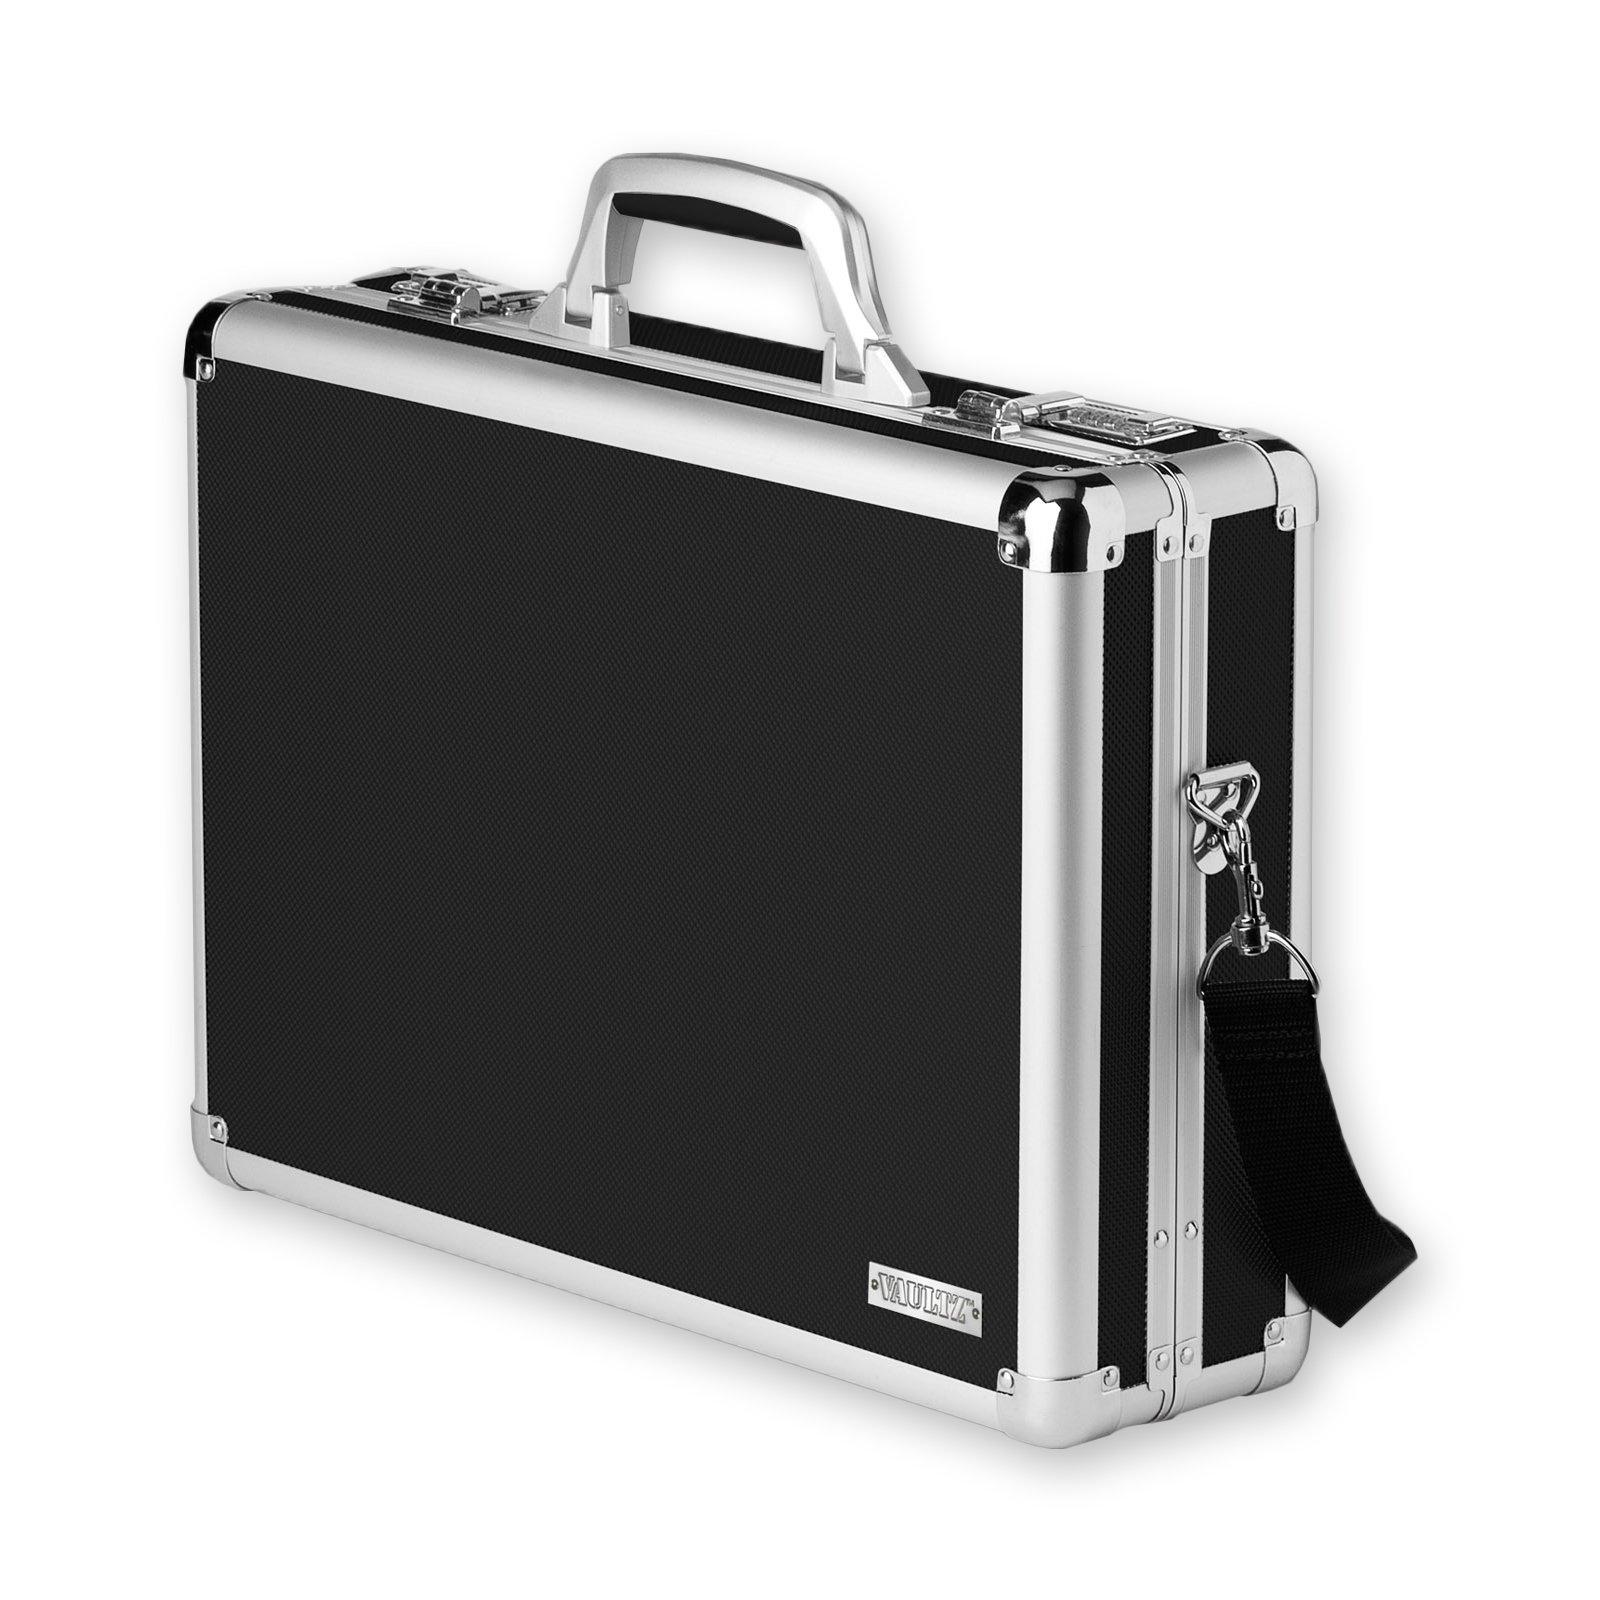 Vaultz Locking Laptop Case, Black (VZ01216)